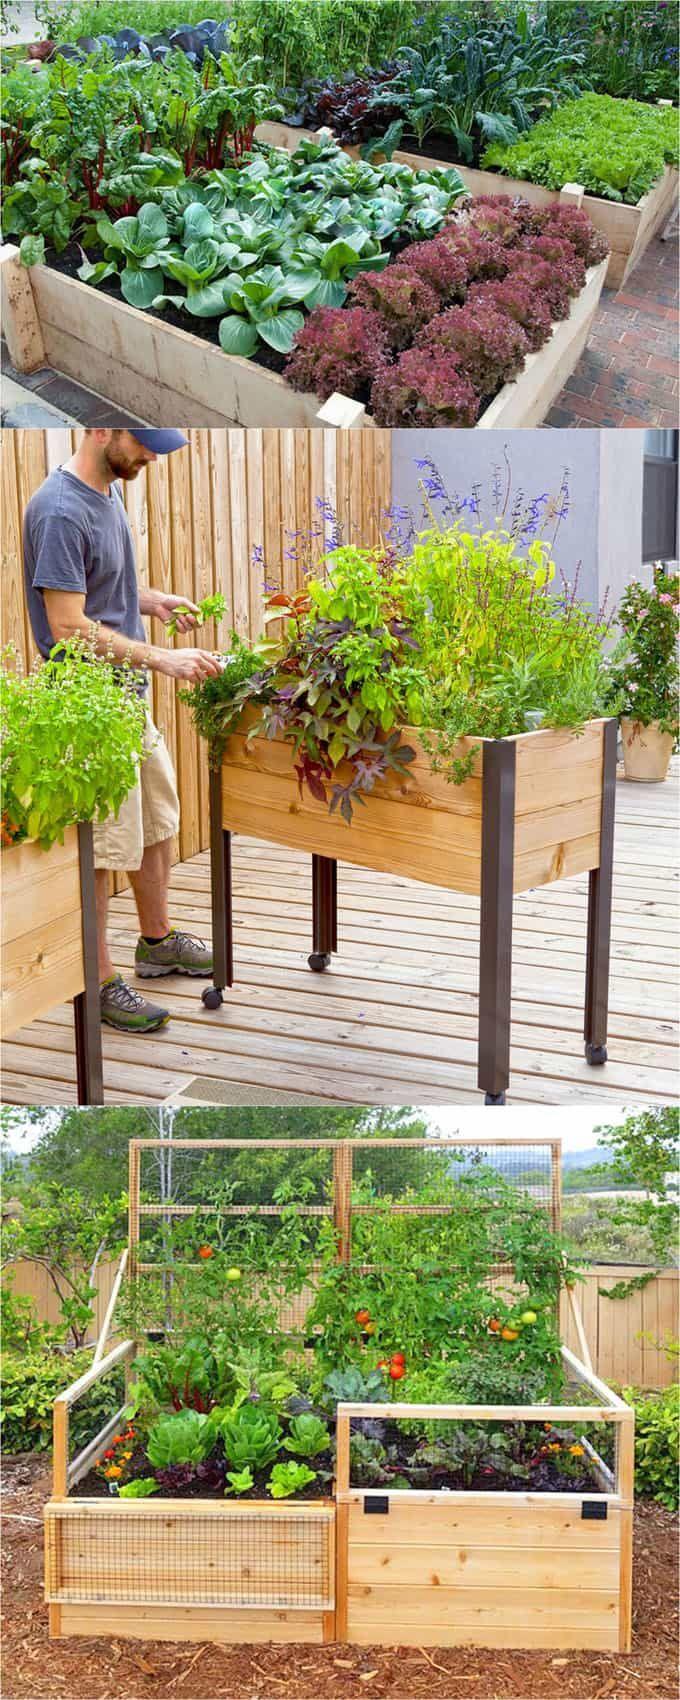 amazing diy raised bed gardens gardenyard ideas pinterest